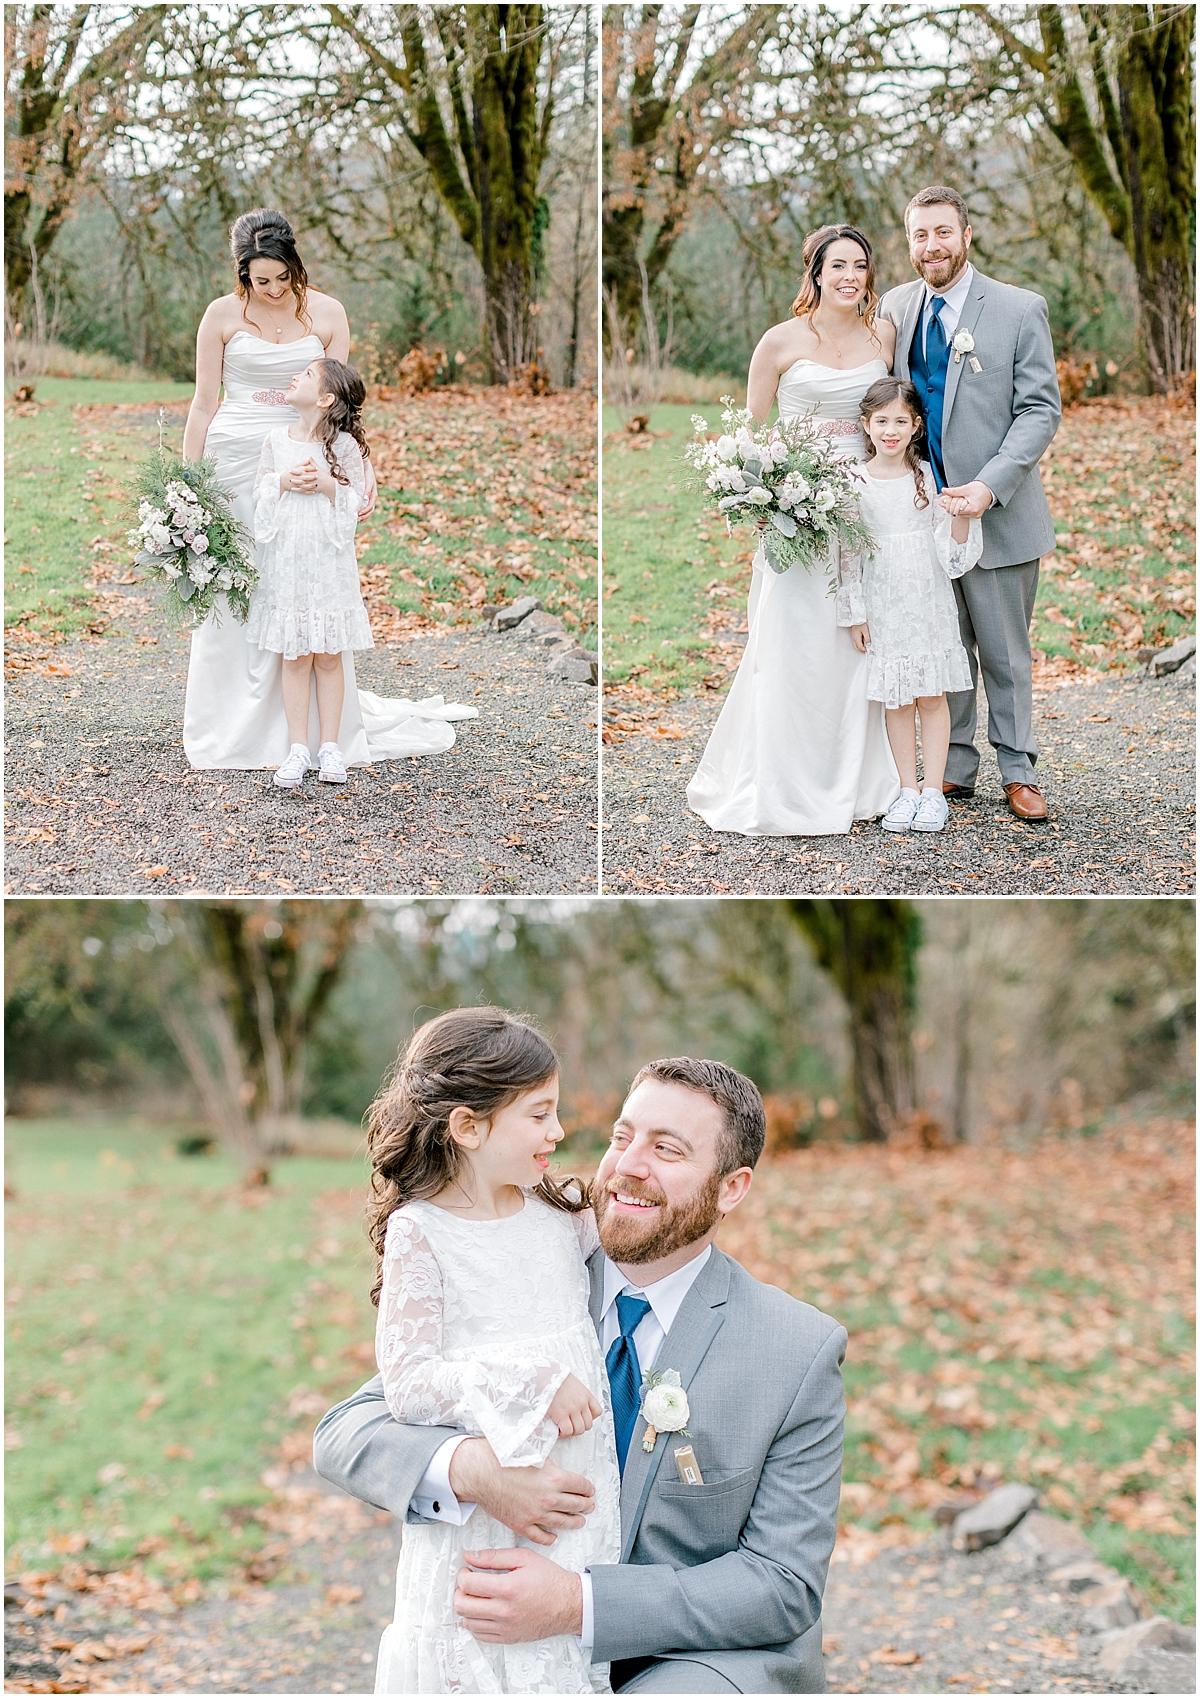 Chehalis Washington Winter Wedding Silver and White | Willapa Hills Farm Wedding | Eastham | Emma Rose Company PNW Light and Airy Wedding Photographer_0034.jpg